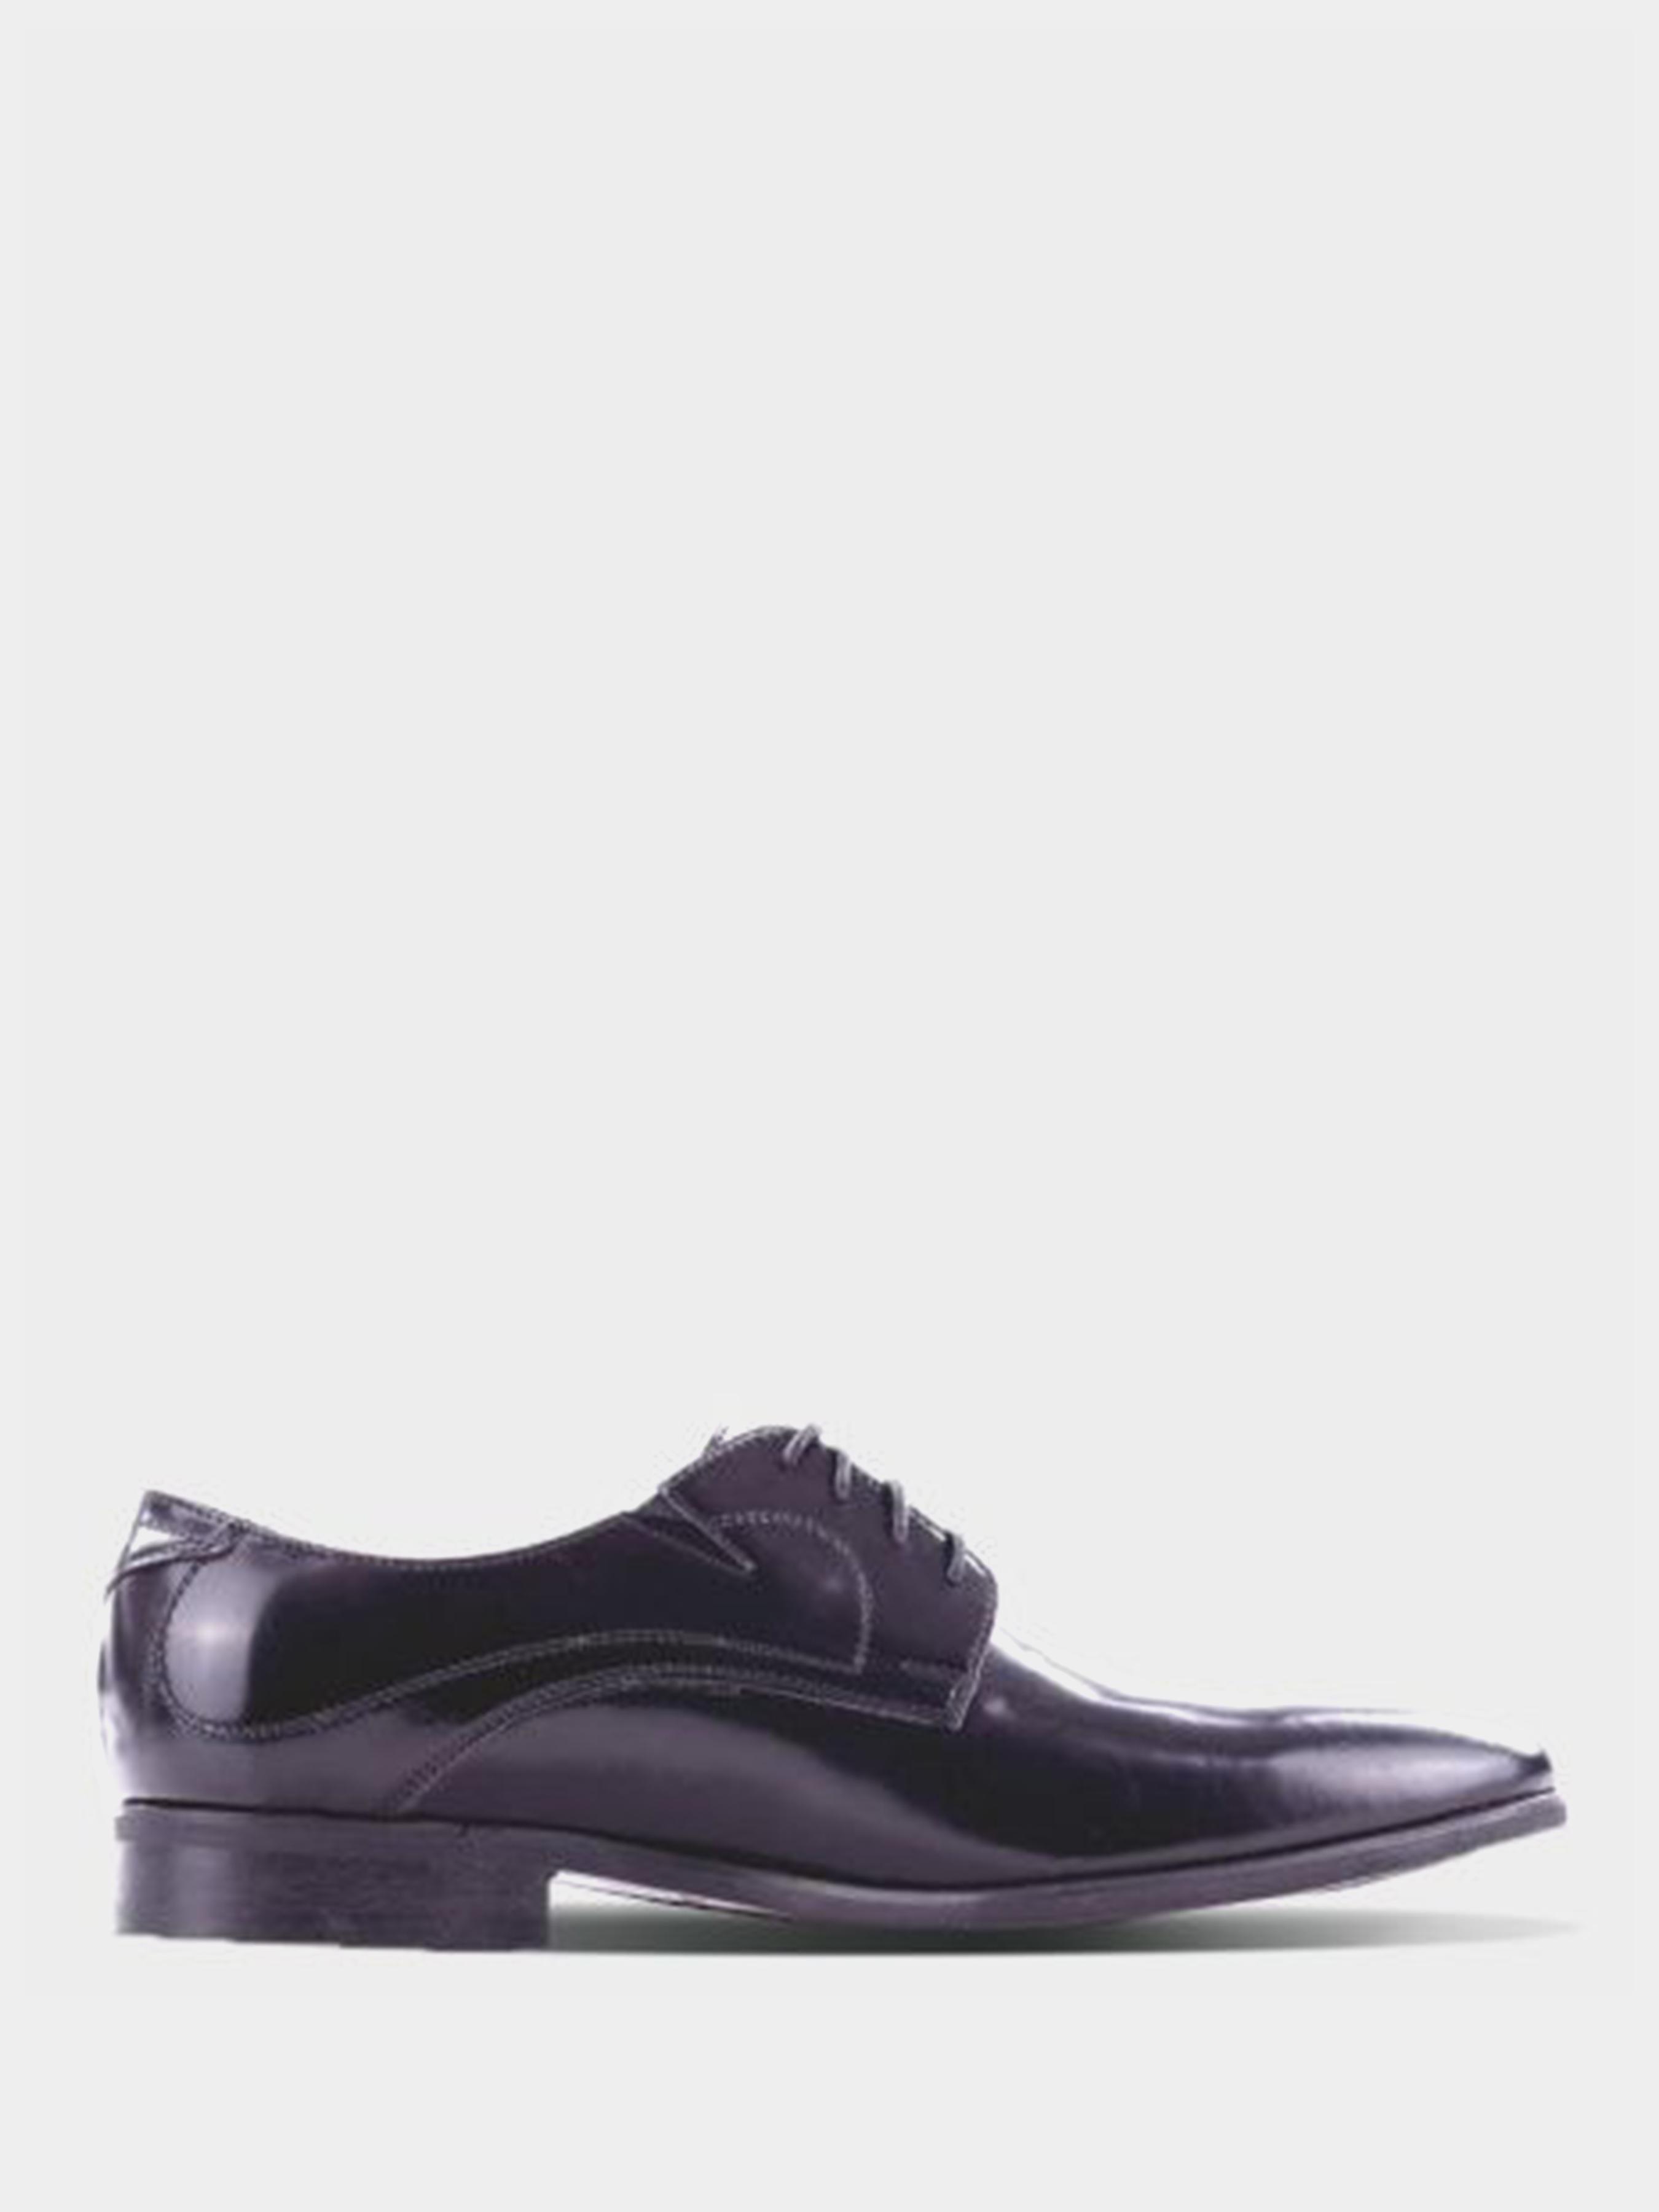 Полуботинки для мужчин Ан-Юс 8H19 размерная сетка обуви, 2017